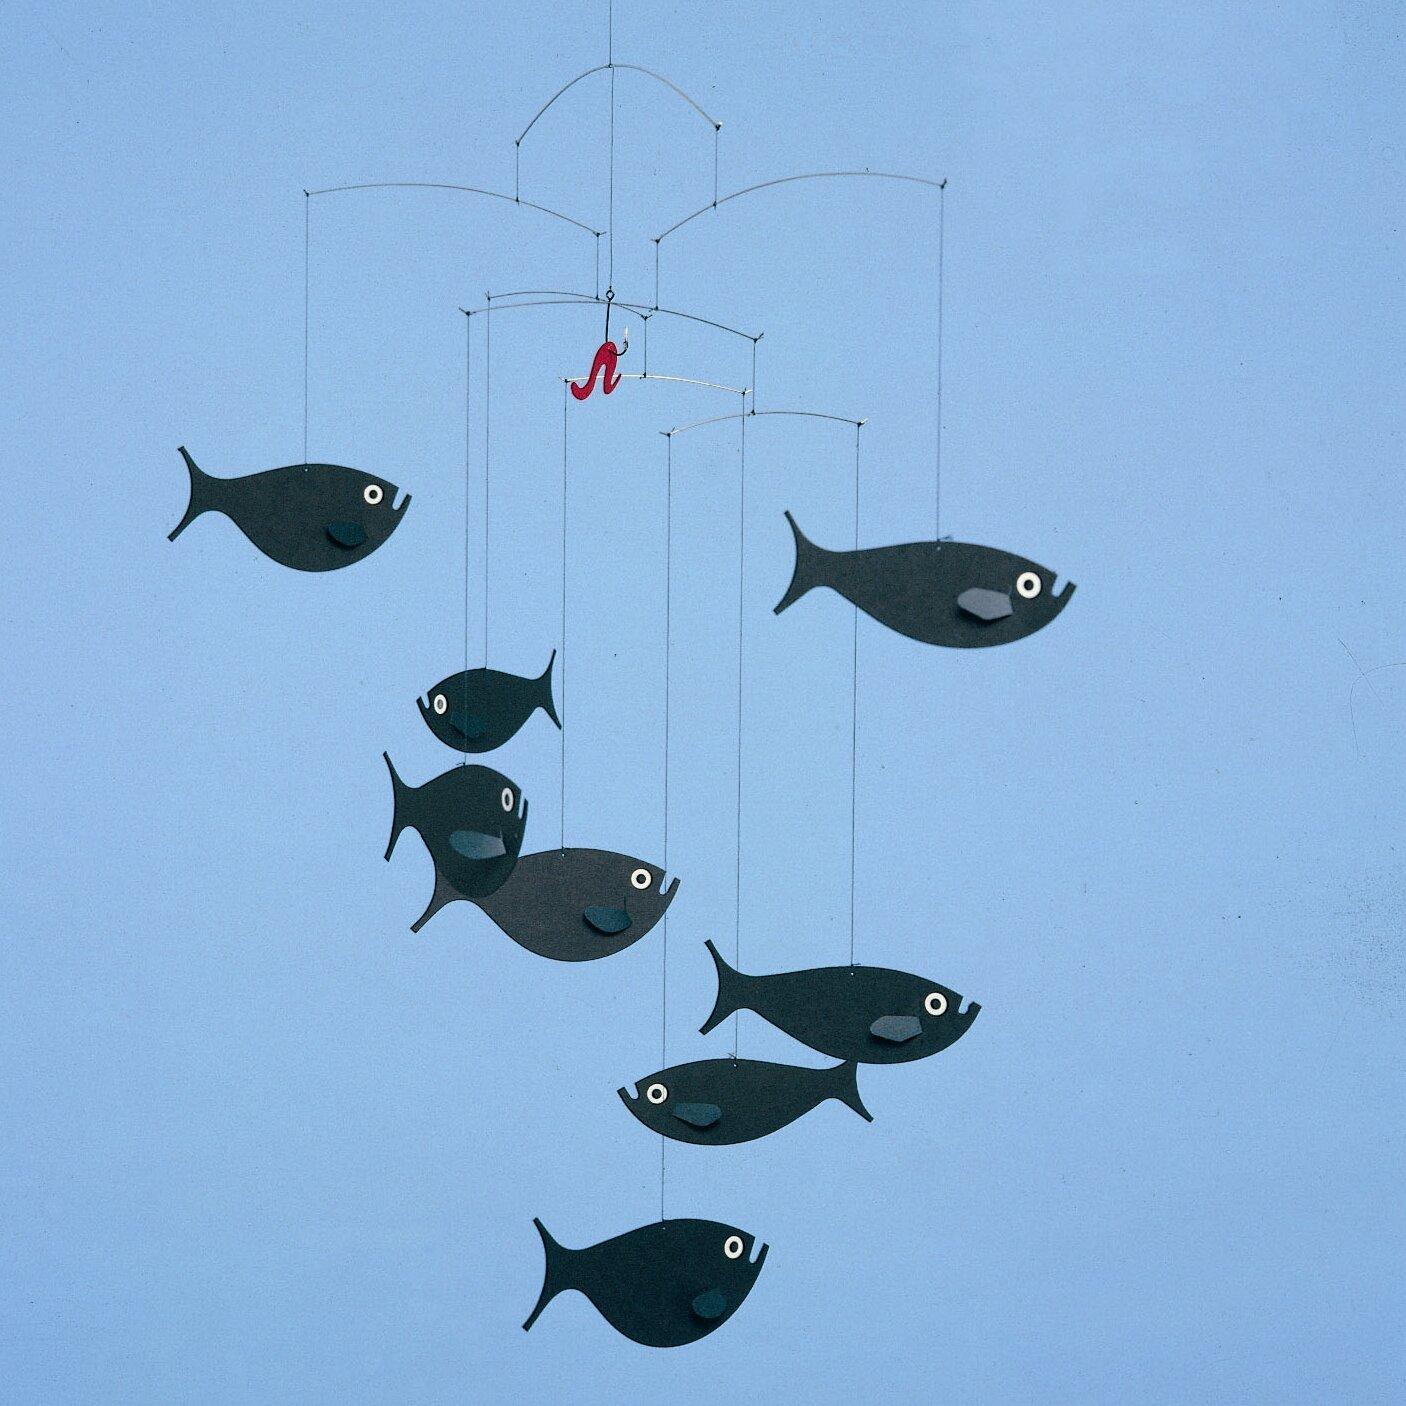 Flensted mobiles shoal of fish mobile reviews wayfair - Flensted mobiles ...